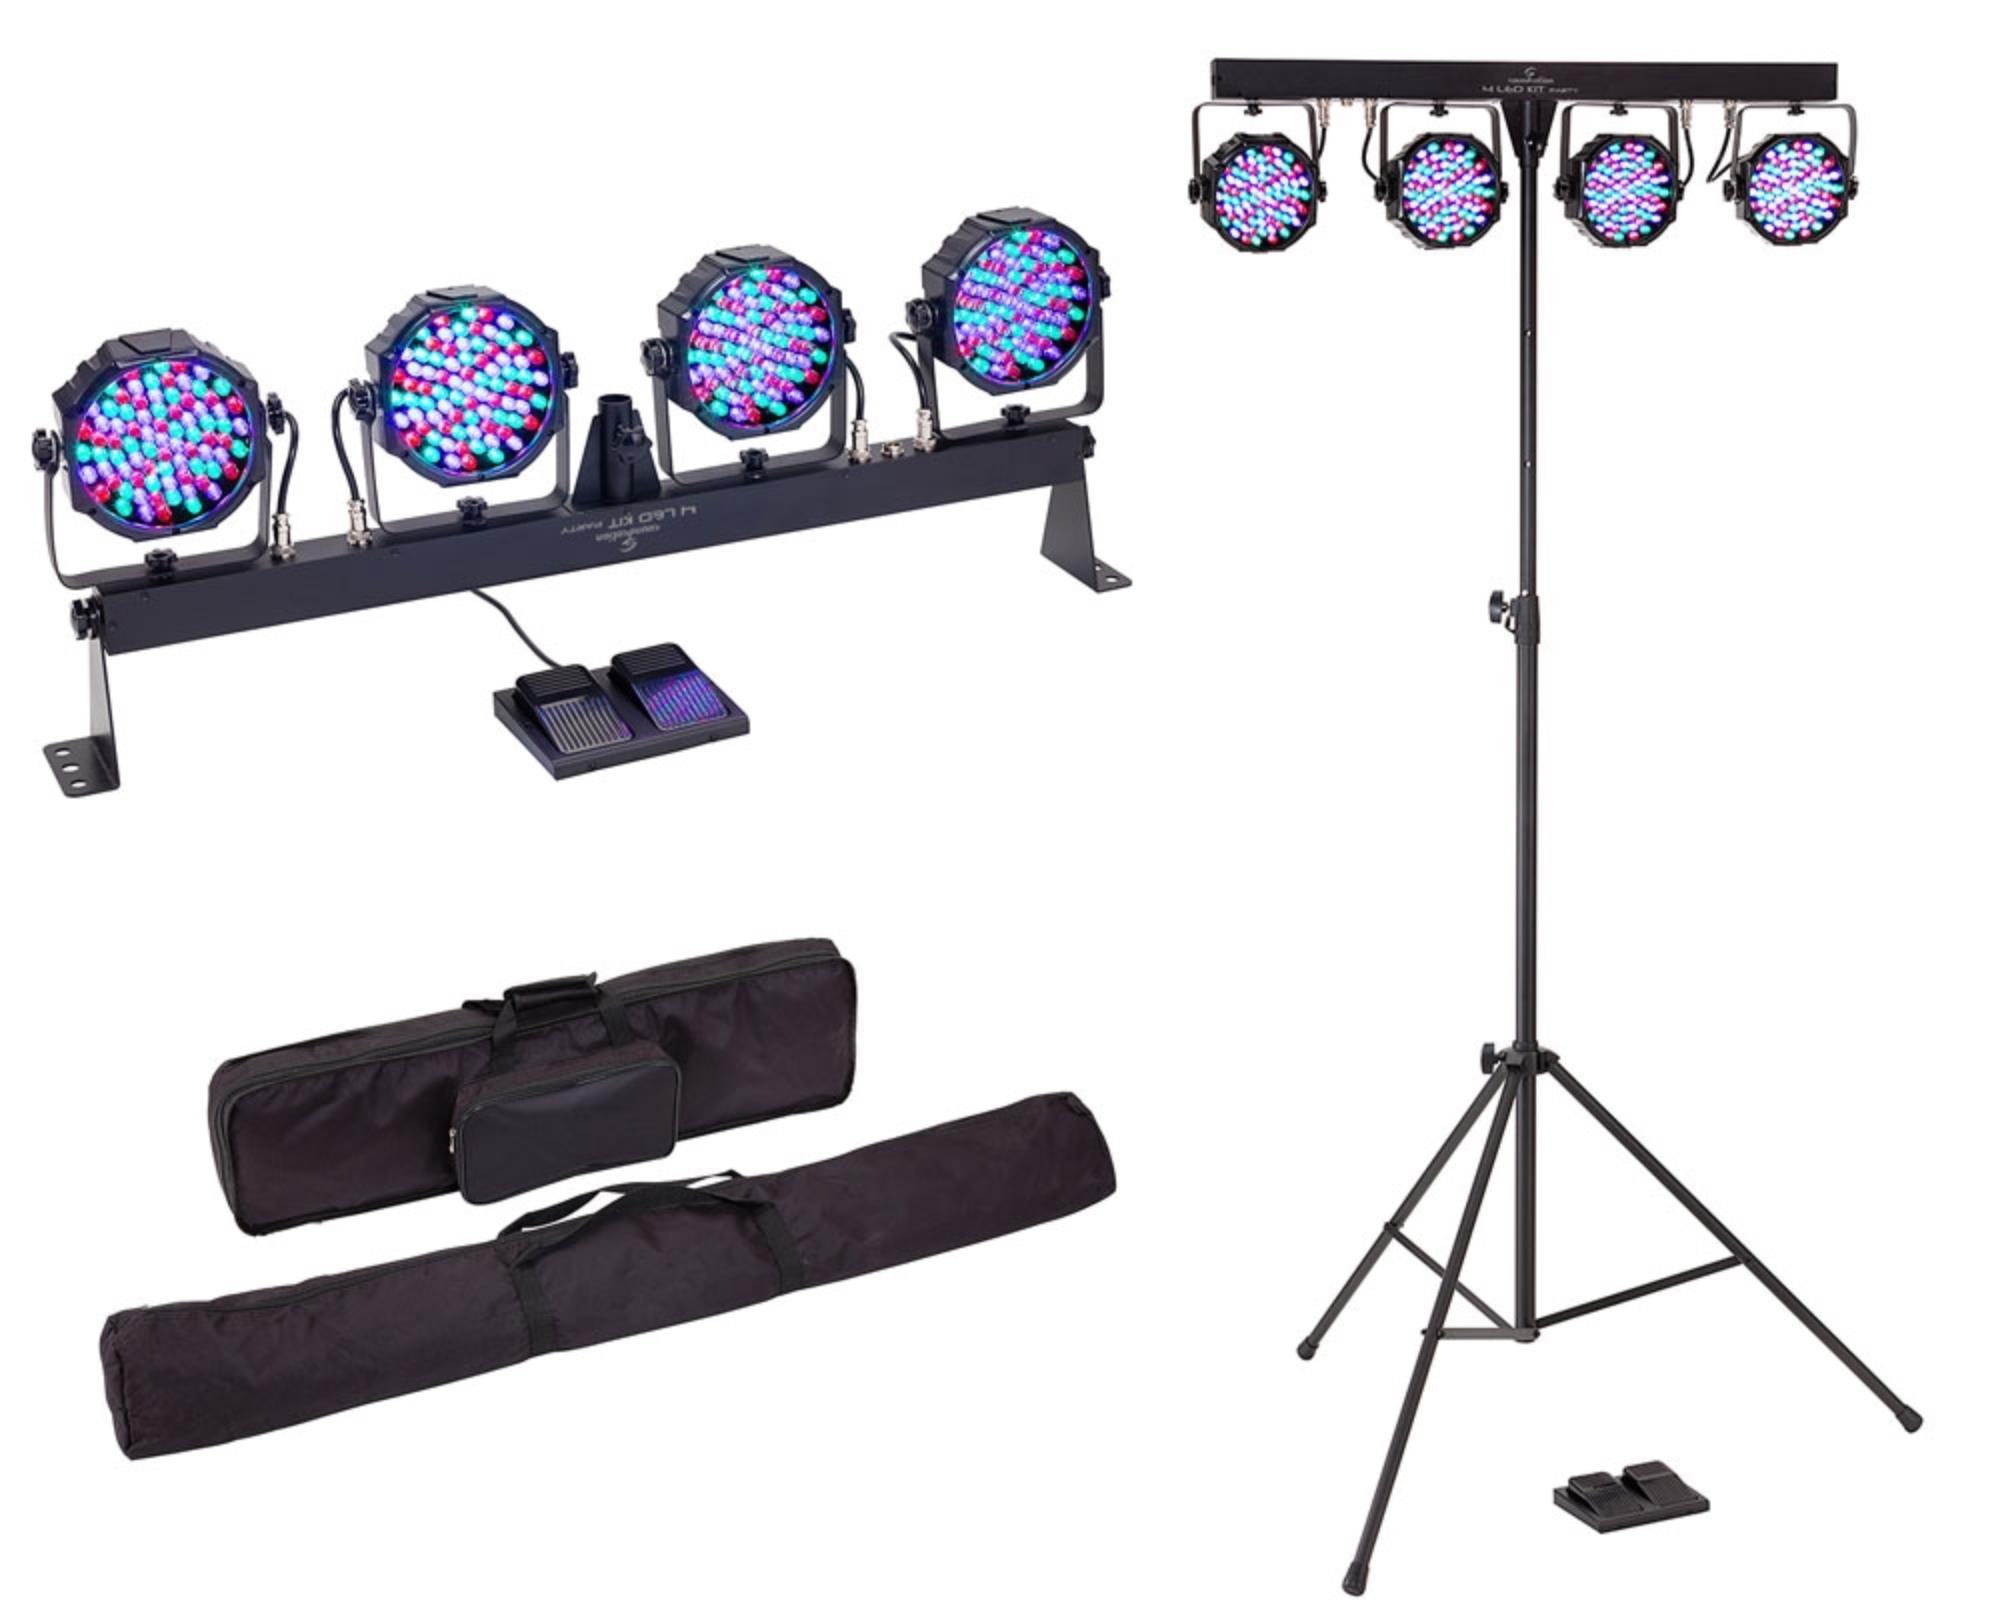 SOUNDSATION-LED-KIT-PARTY-SET-LUCI-PAR-sku-24695